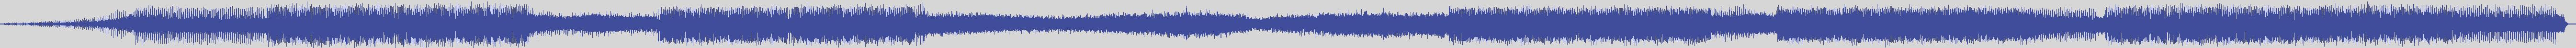 just_digital_records [JS1321] Bardini Experience, Chris P - The Movie [Original Mix] audio wave form